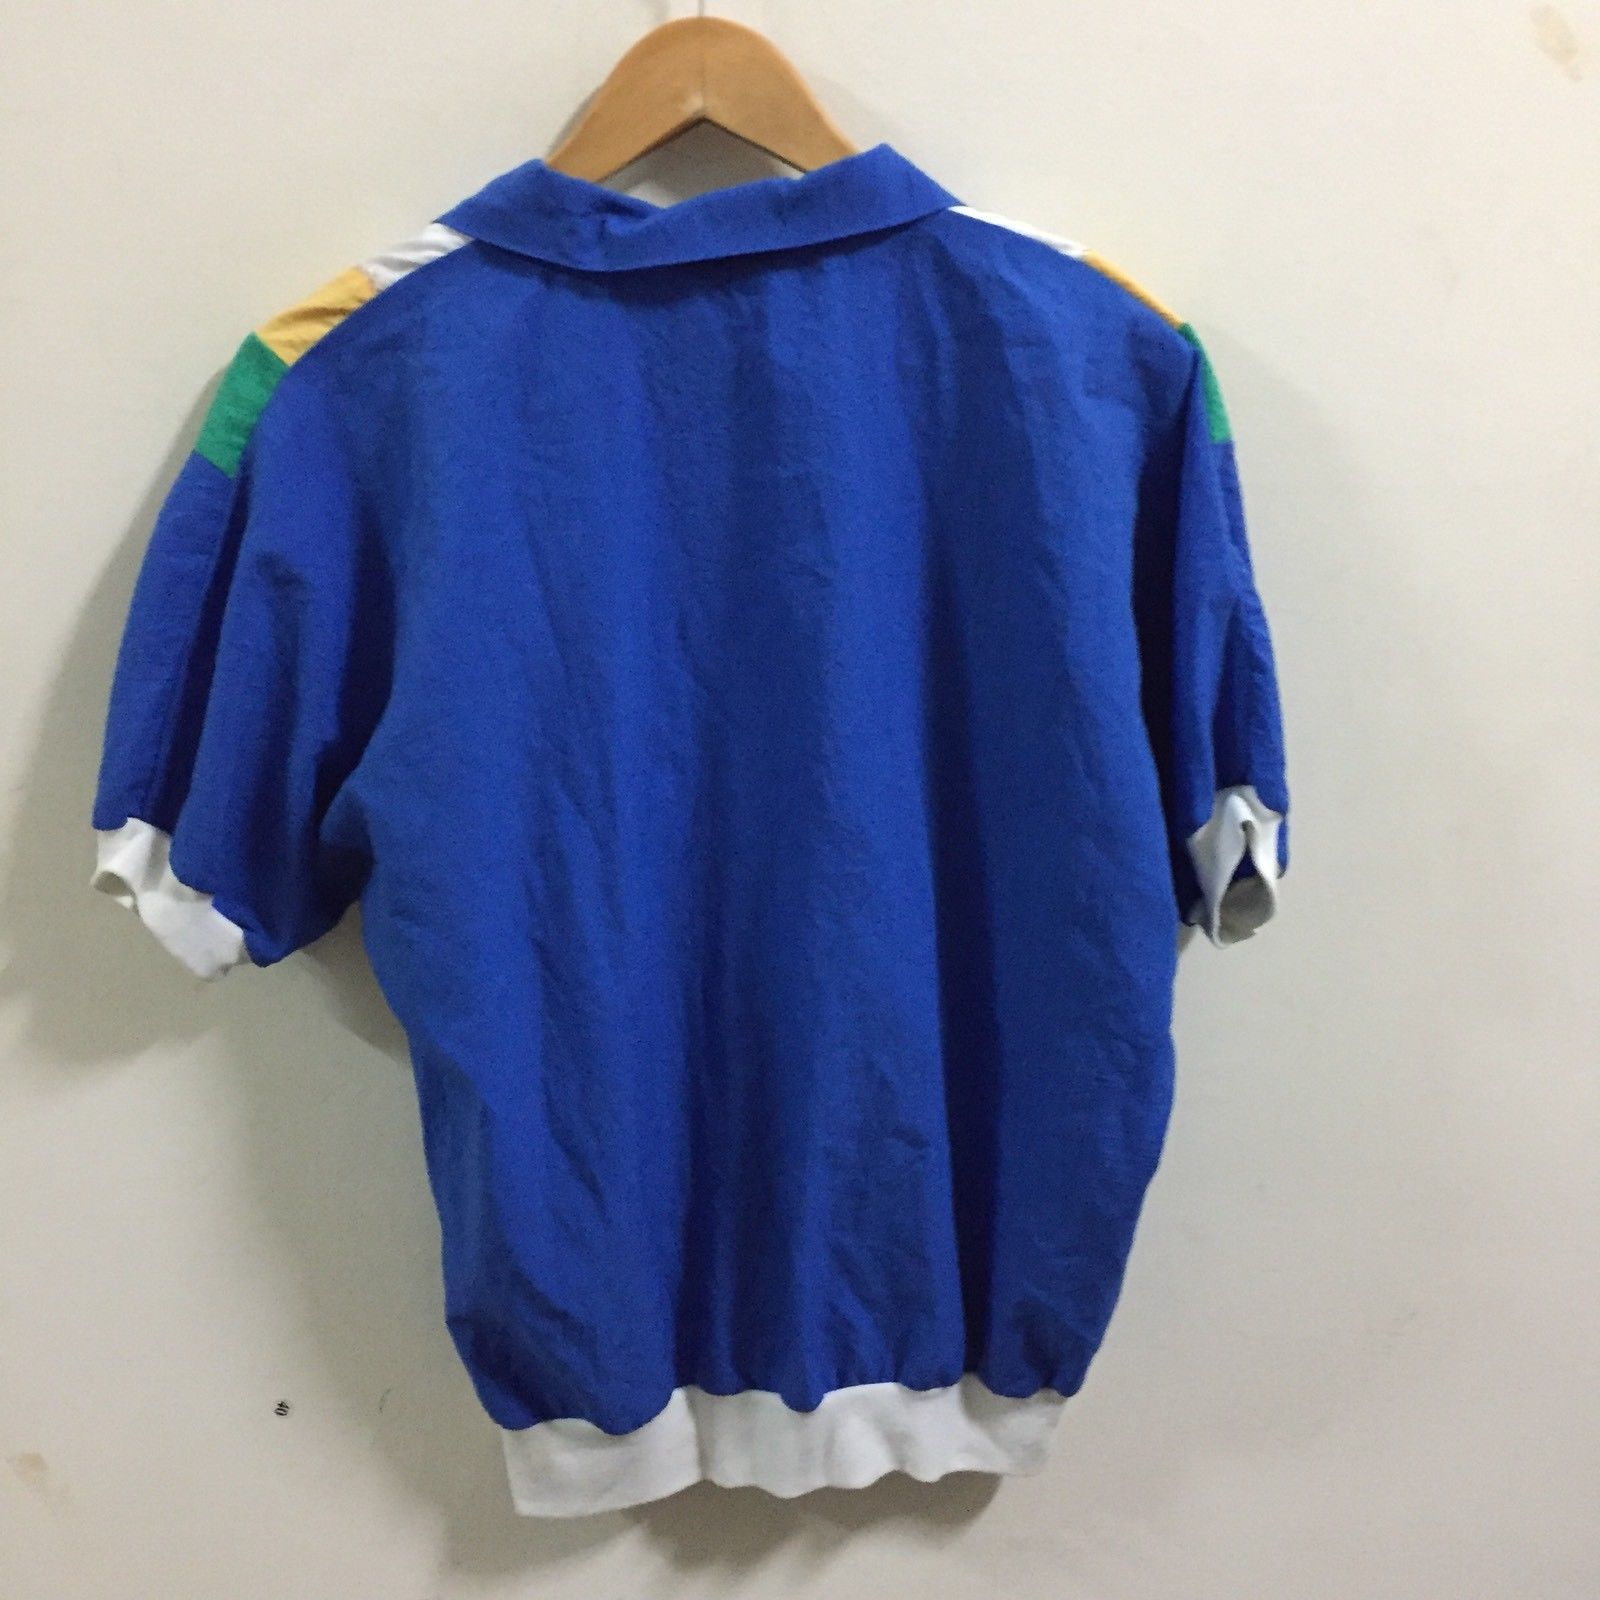 VTG 90's Gape God Tops T-Shirt SZ L ColorBlock  Rare Made In USA image 7